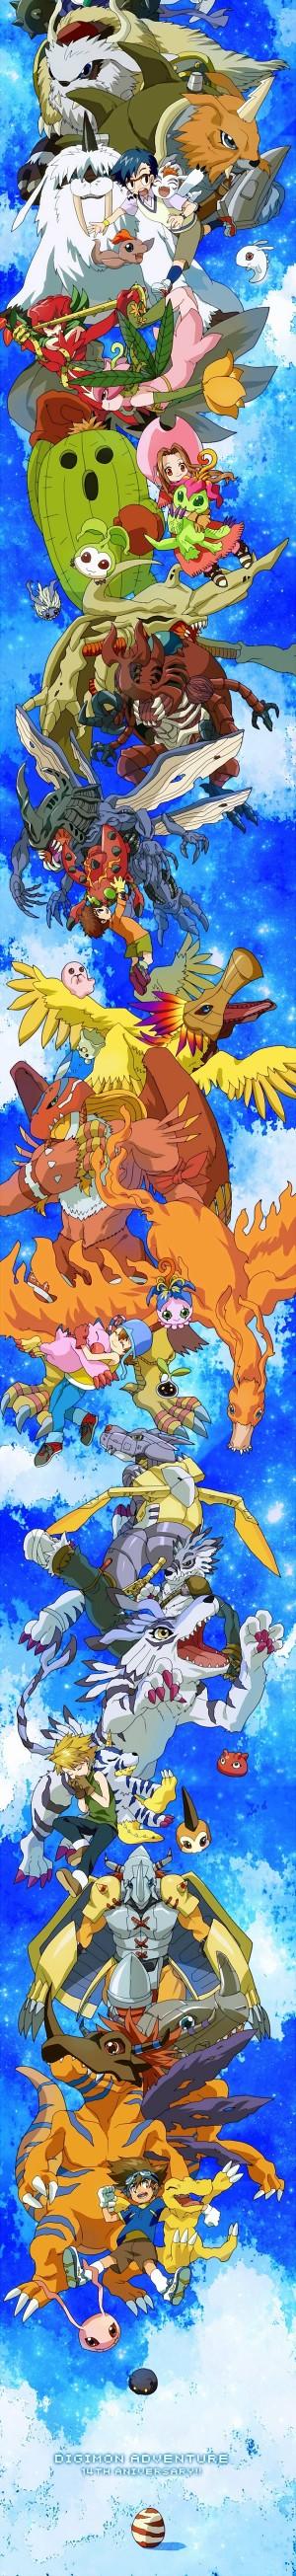 Personagens Disney ao estilo Avatar   Zona Nerd